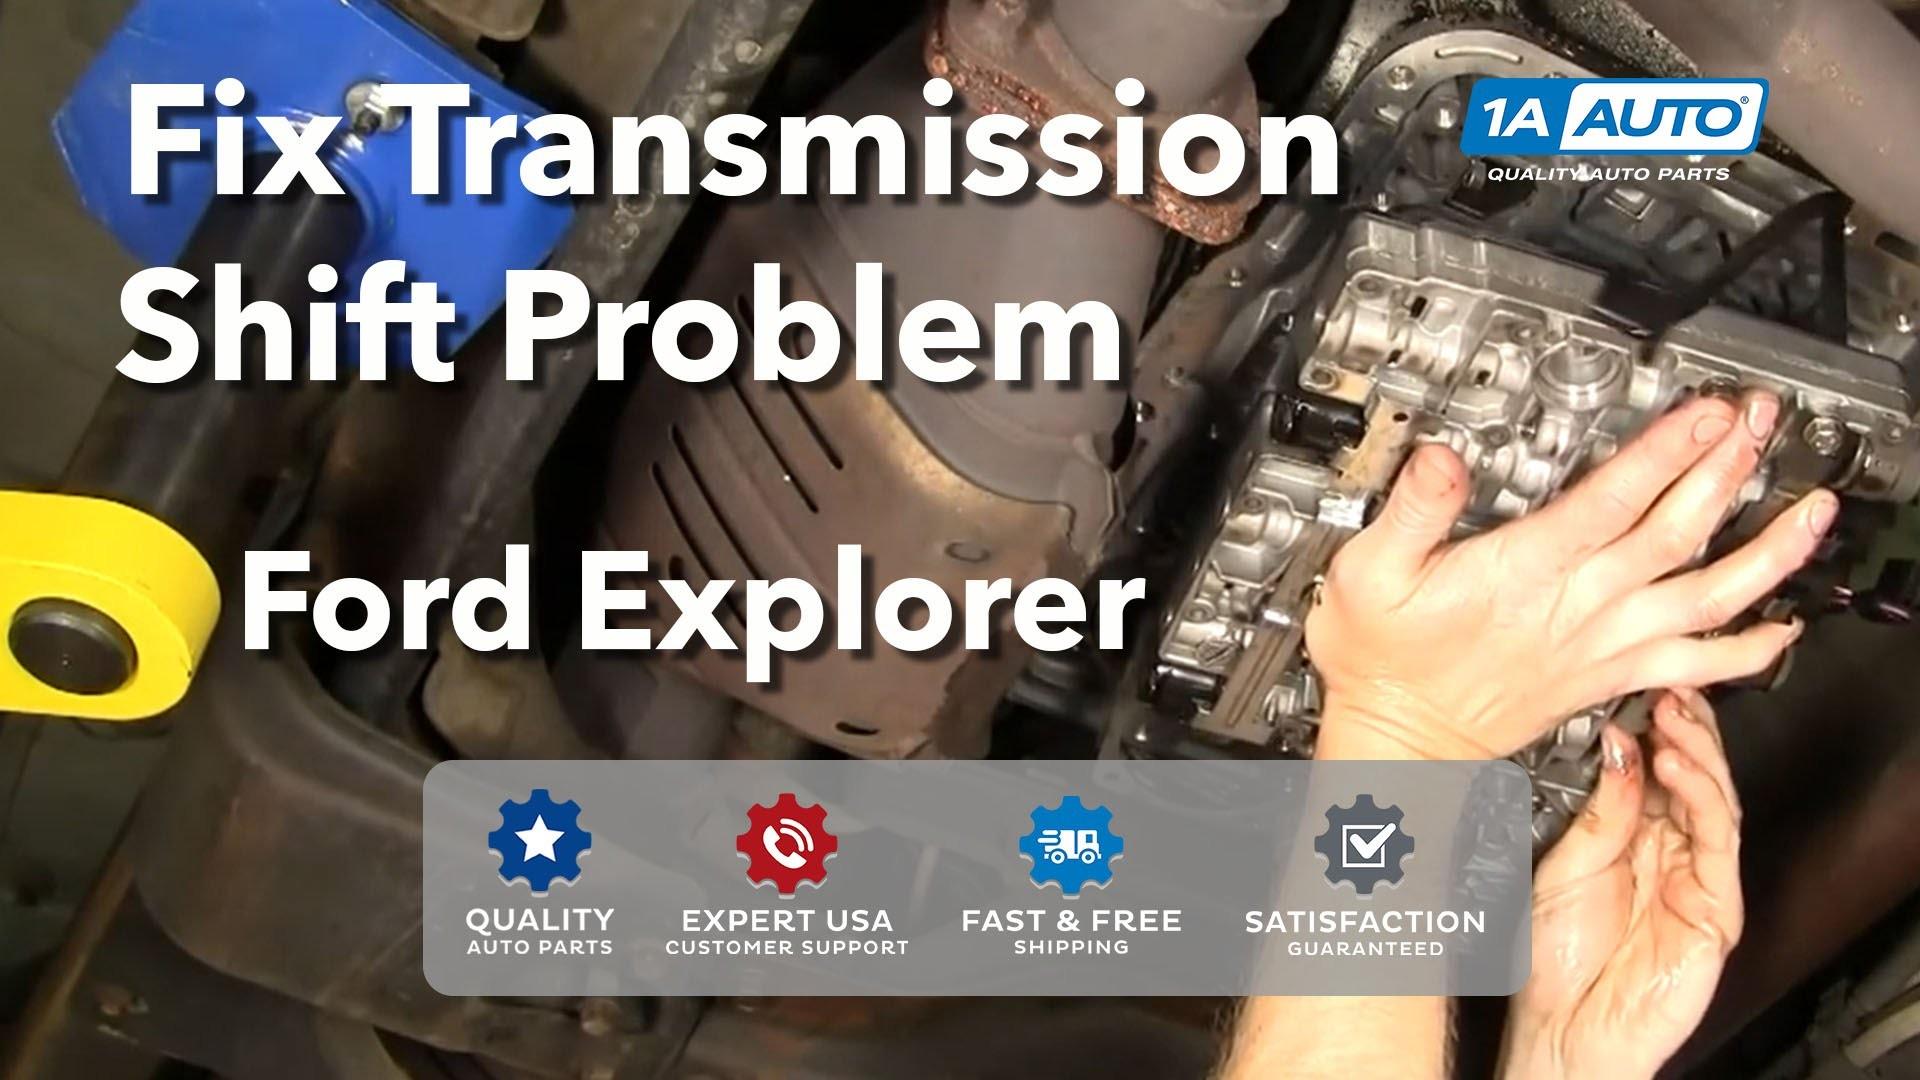 1995 ford Explorer Engine Diagram Auto Repair Fix Transmission Shift Problem ford 5r55e Explorer Buy Of 1995 ford Explorer Engine Diagram